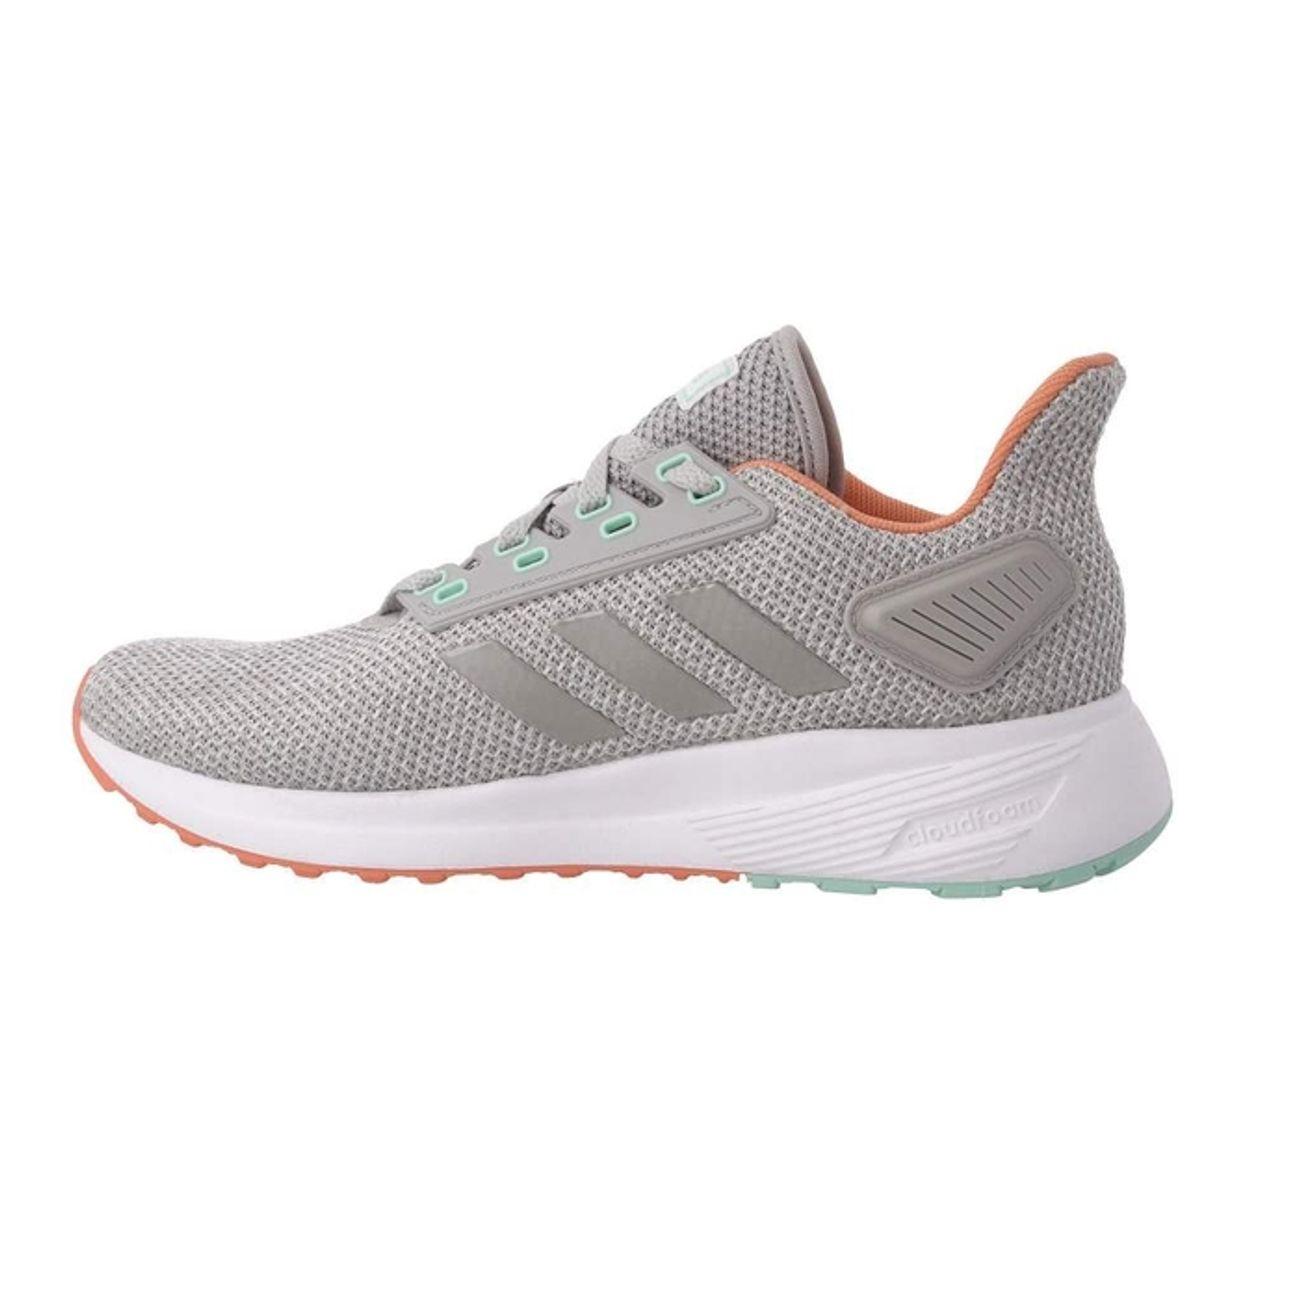 best sneakers 25f34 7c644 ... CHAUSSURES BASSES running femme ADIDAS DURAMO 9 ...